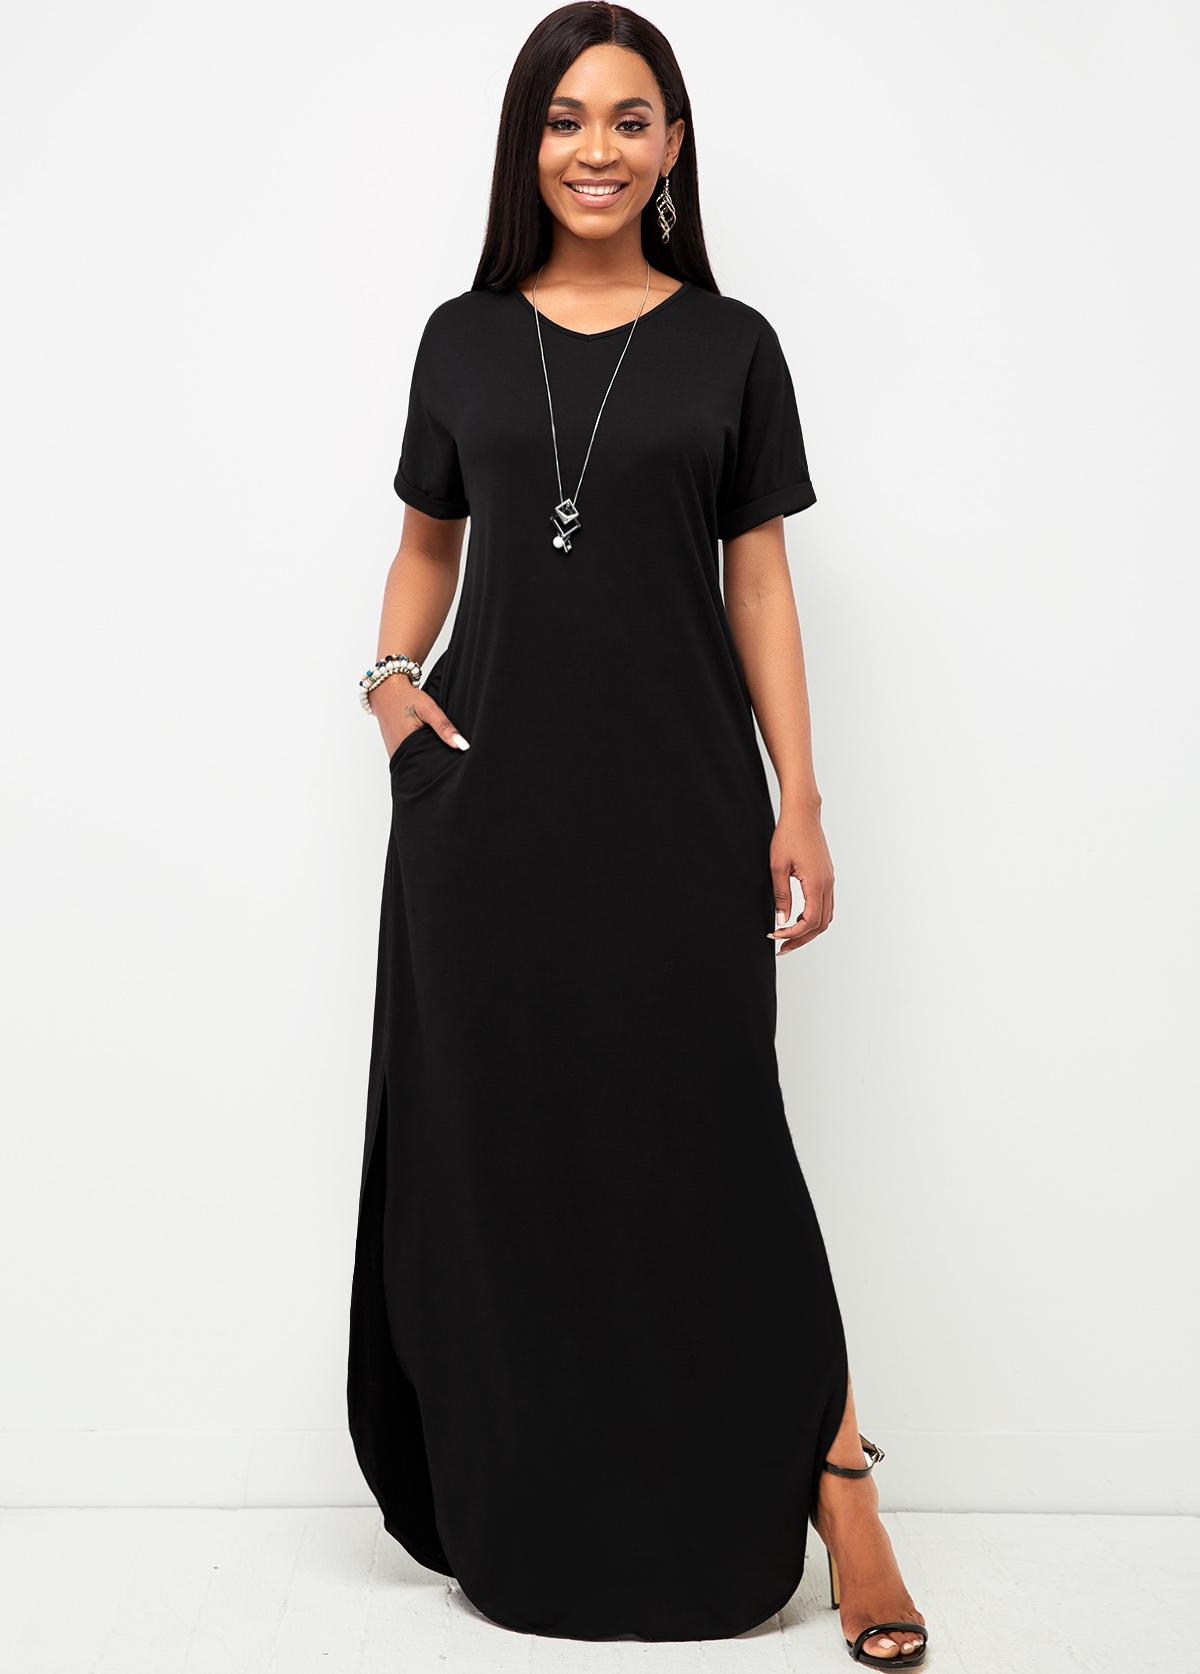 V Neck Black Pocket Casual Dress